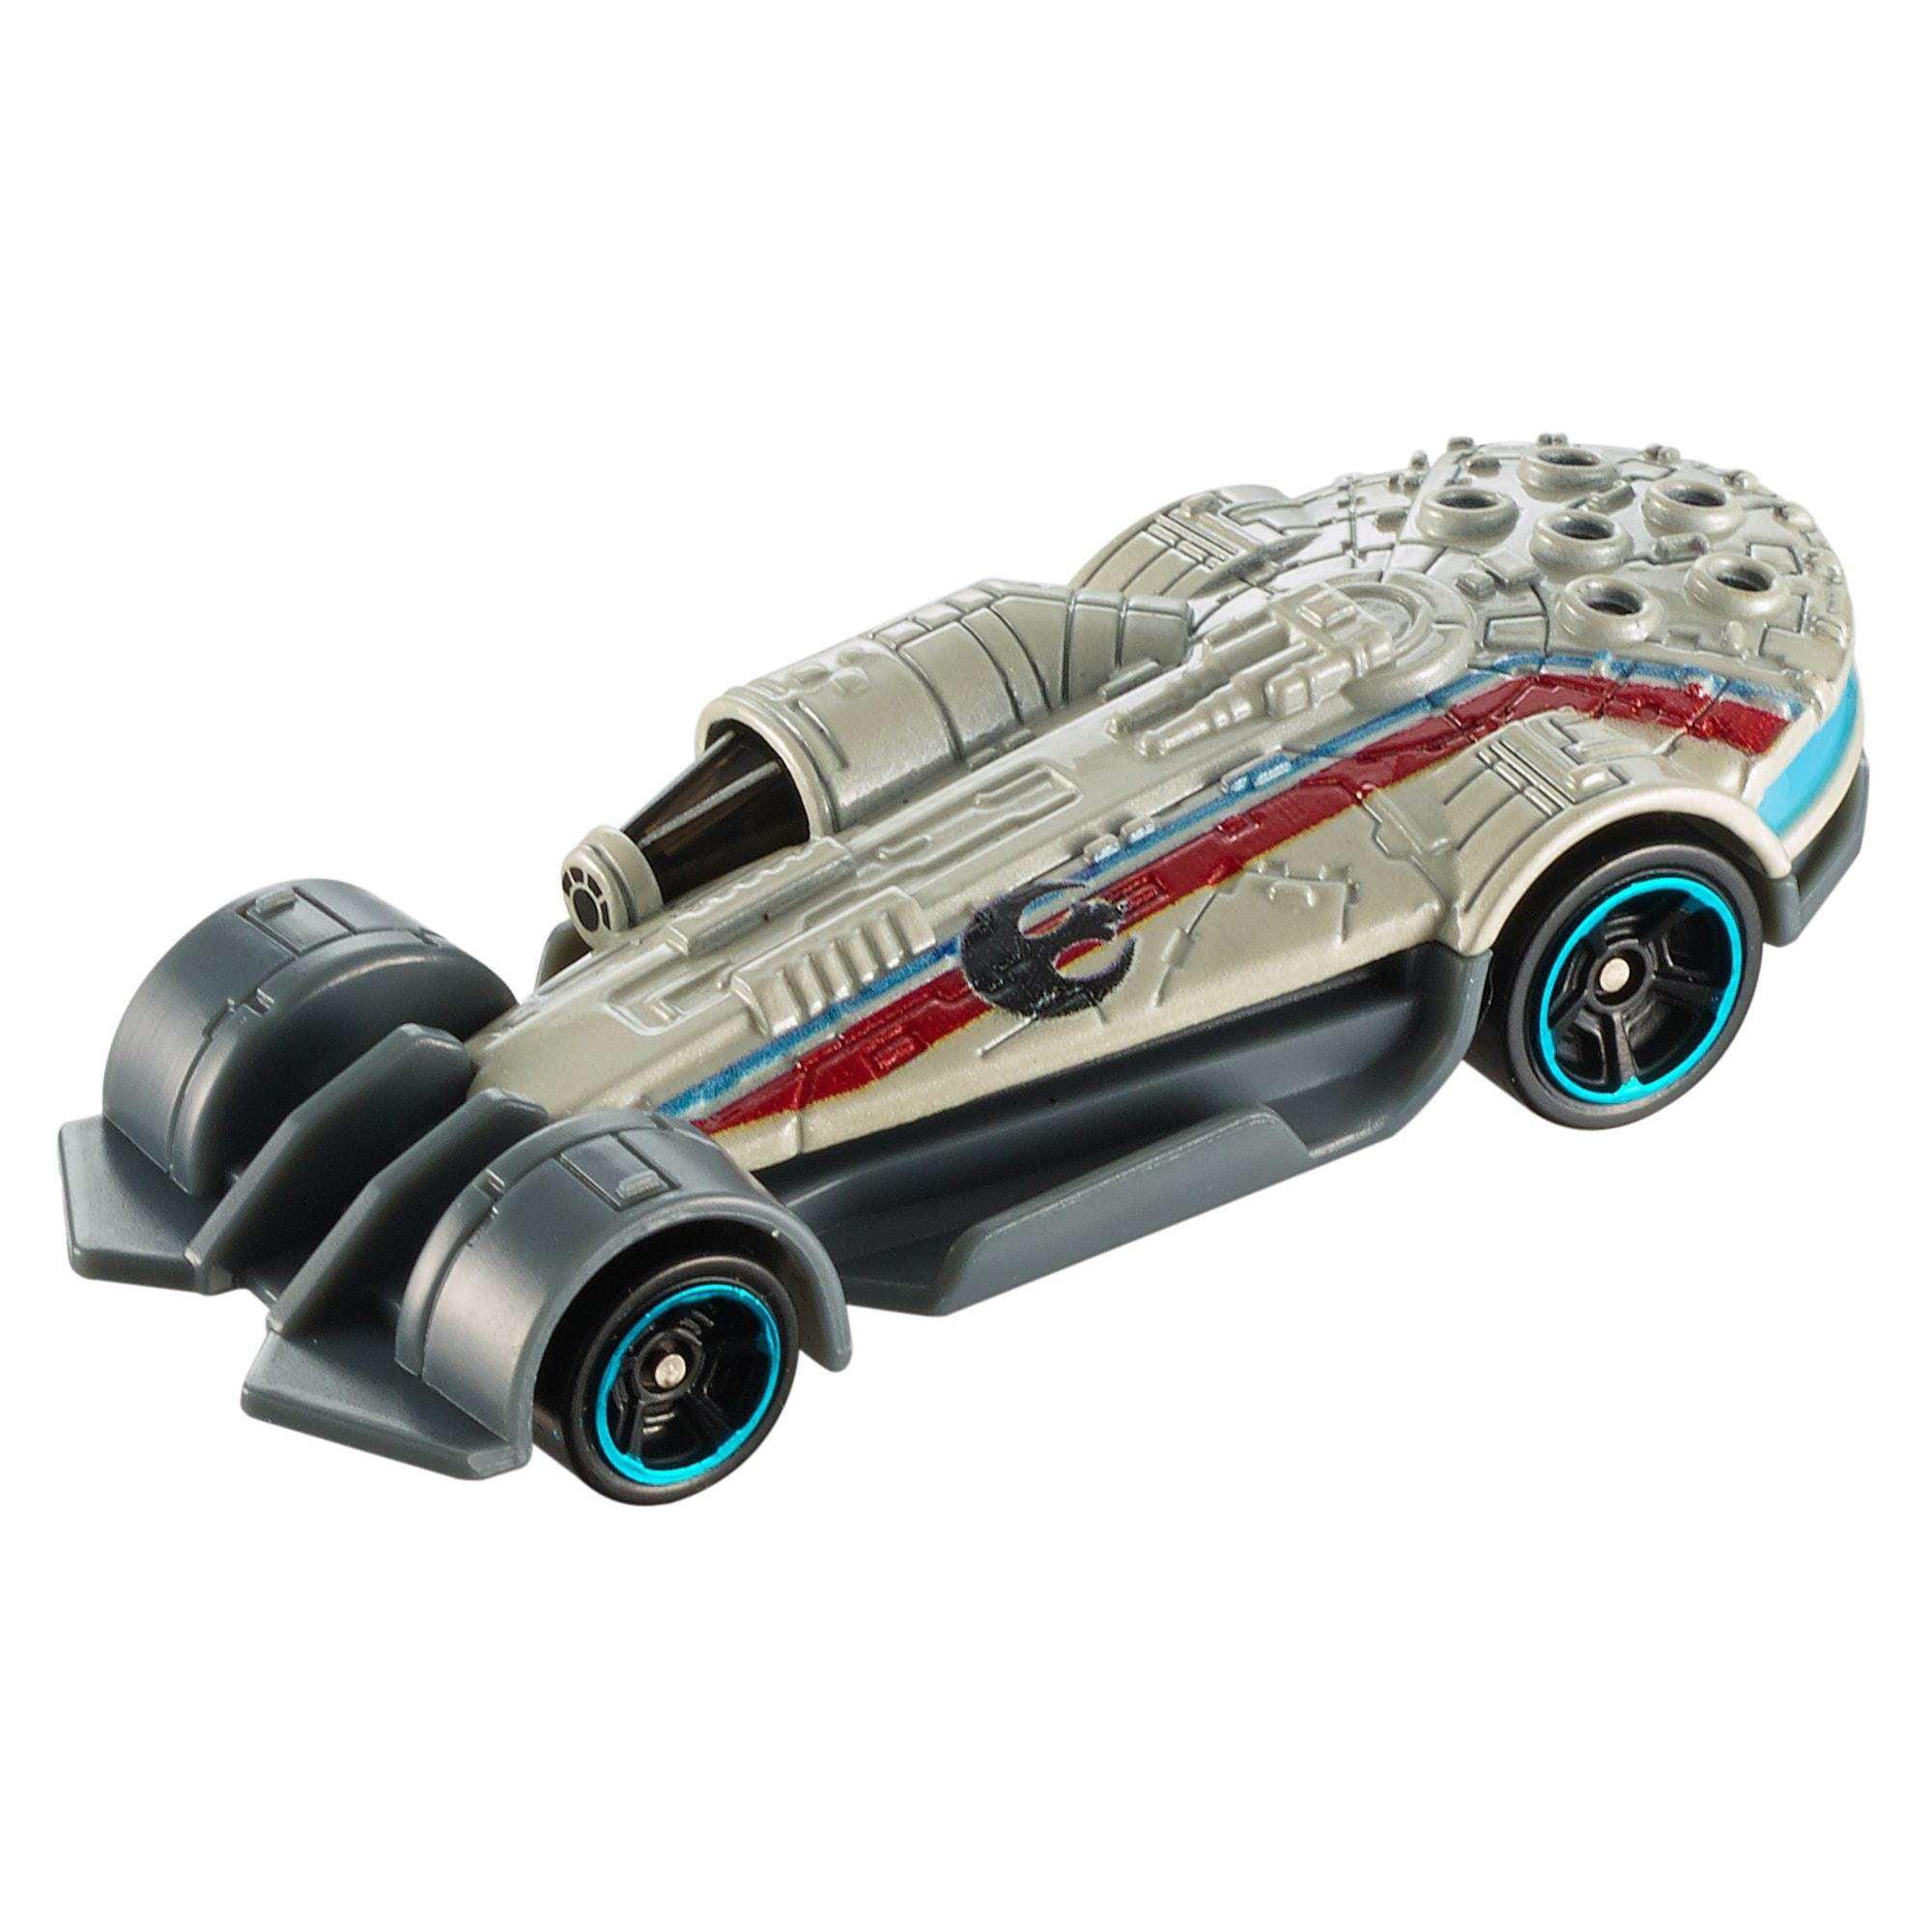 Mattel Hot Wheels Star Wars: The Last Jedi Millennium Falcon, Carship